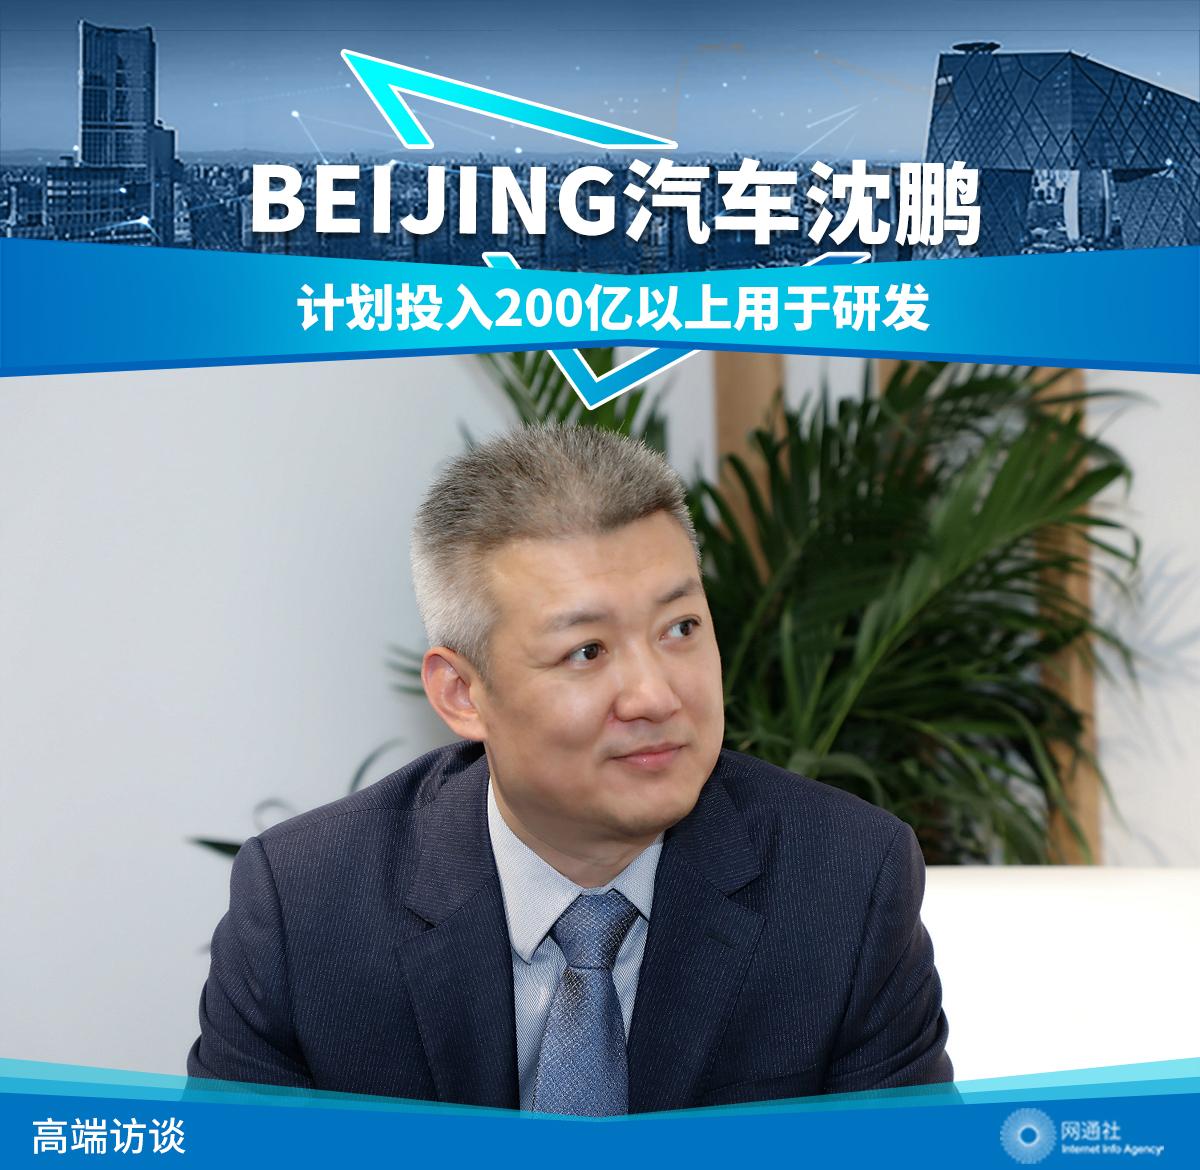 BEIJING汽车沈鹏:计划投入200亿以上用于研发